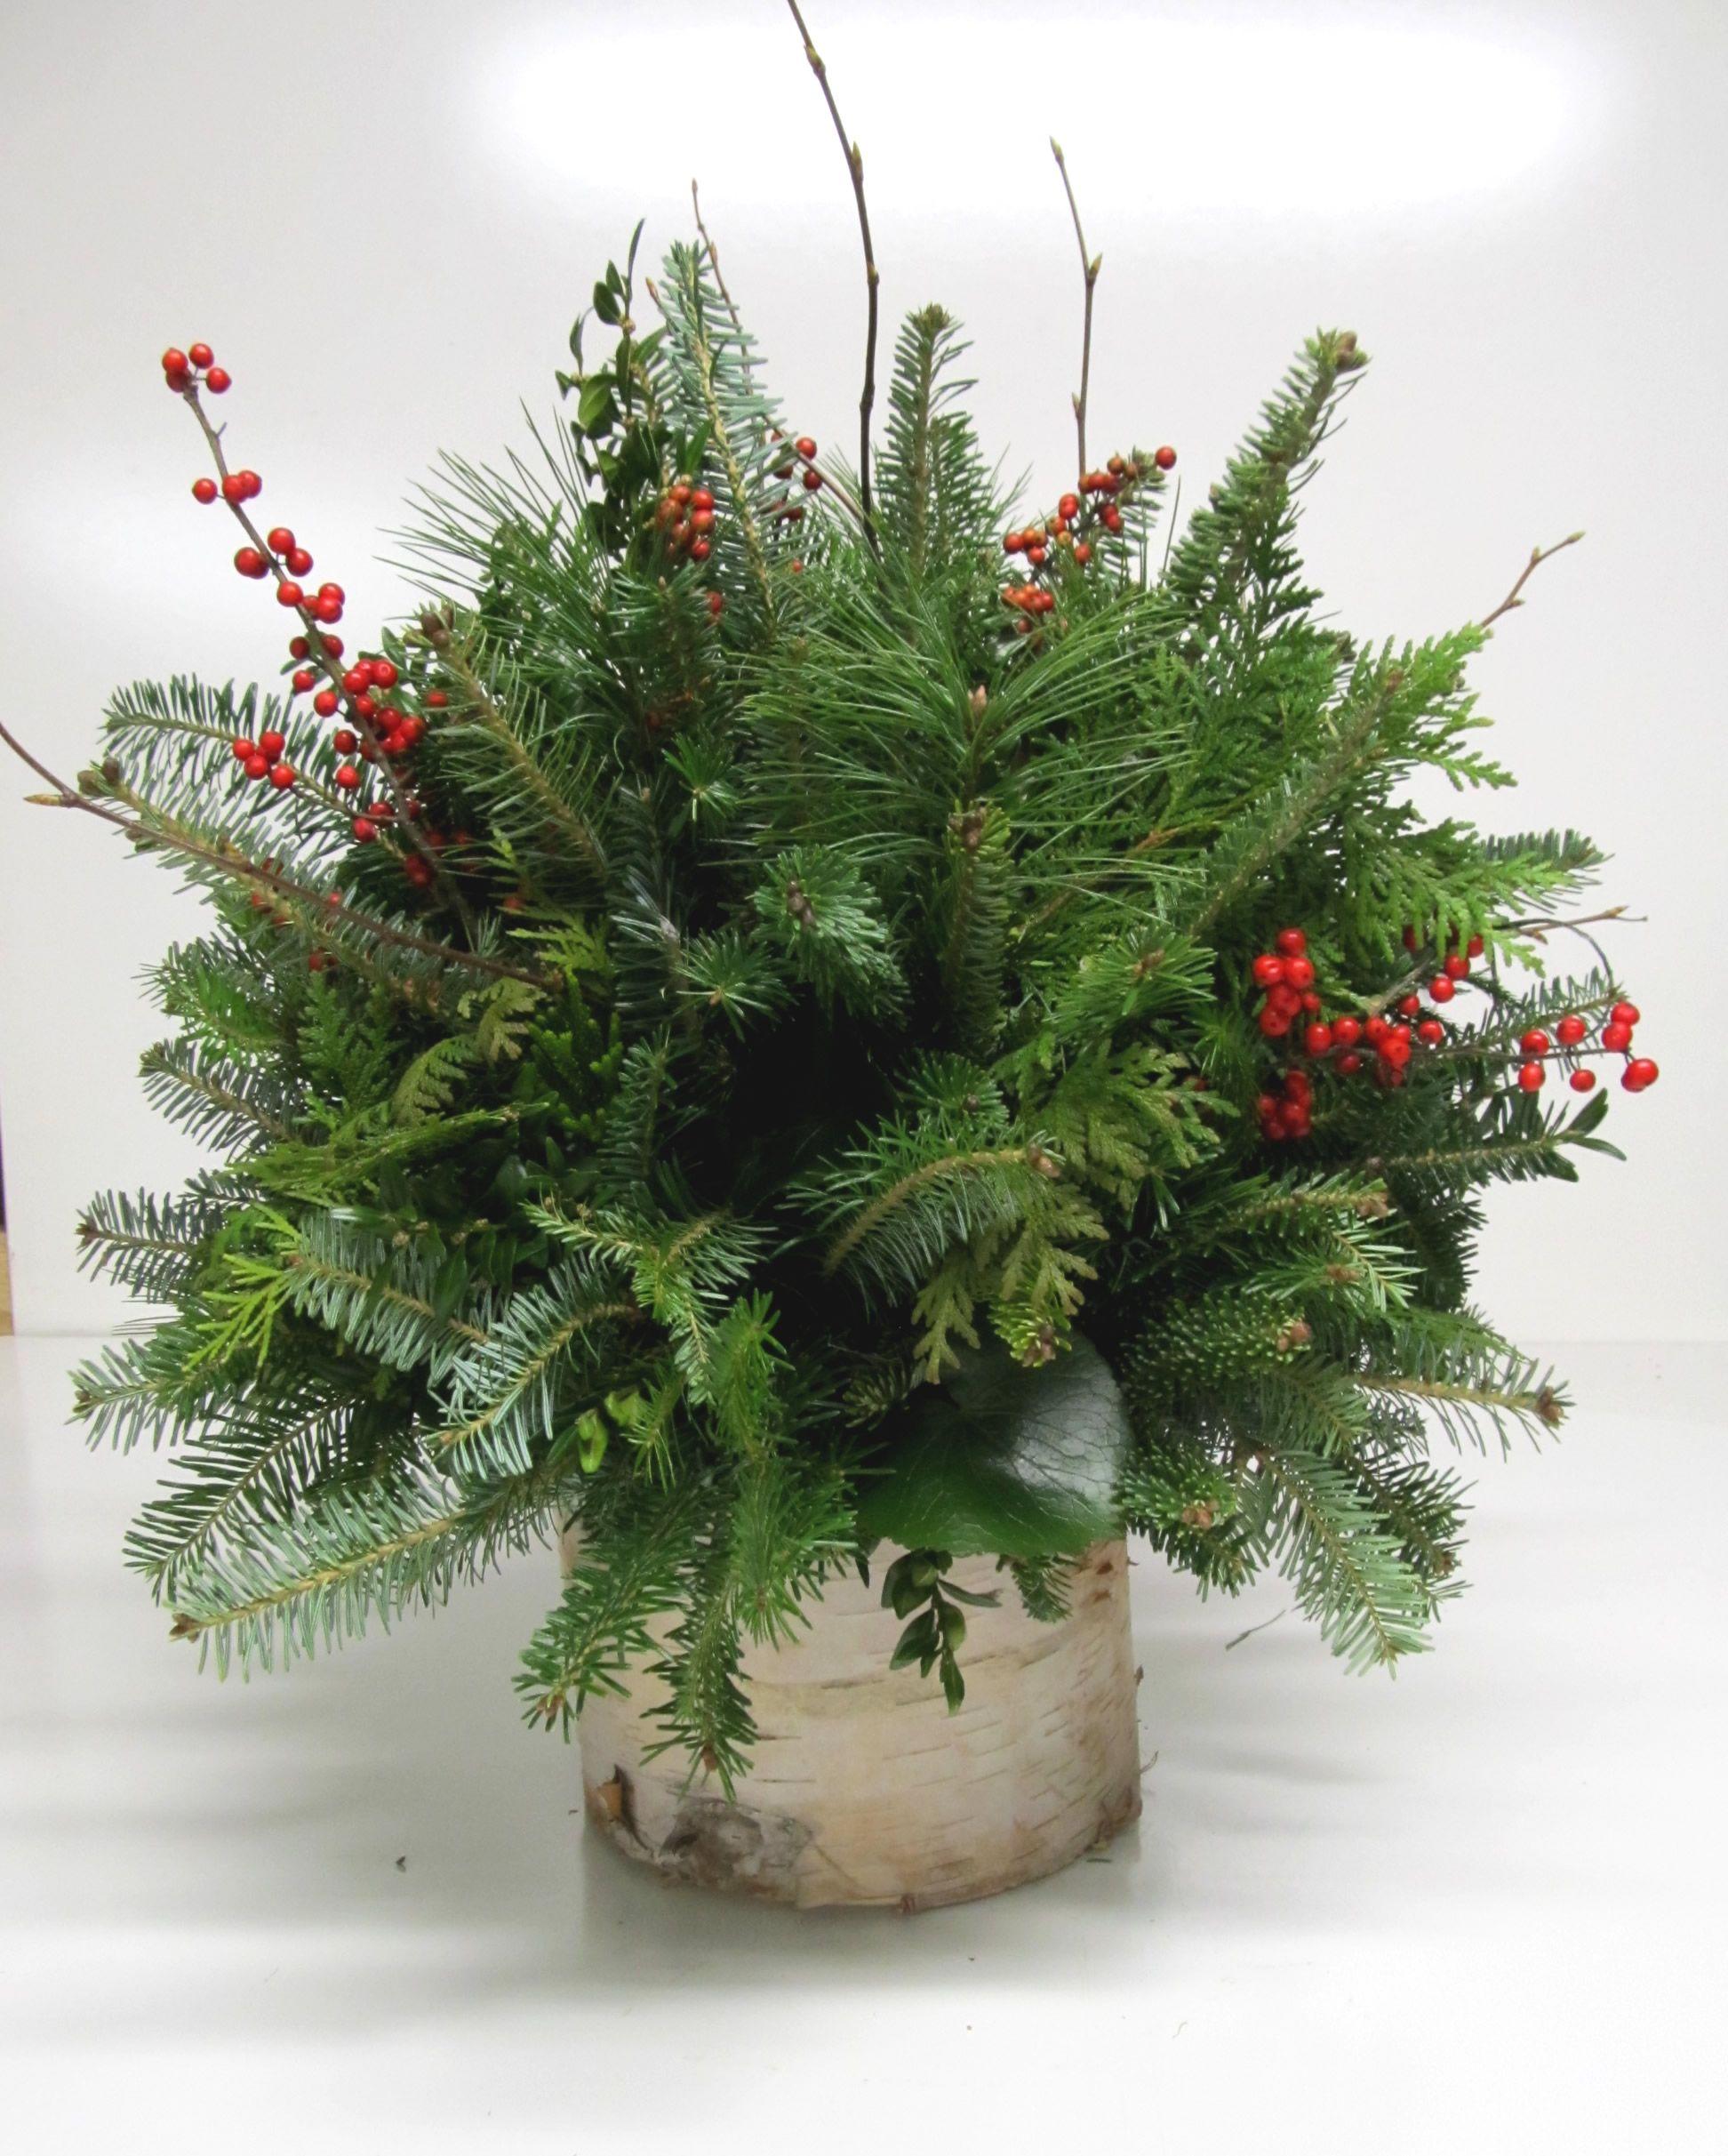 Christmas Greenery Centerpieces.Christmas Arrangements Centerpieces Greenery